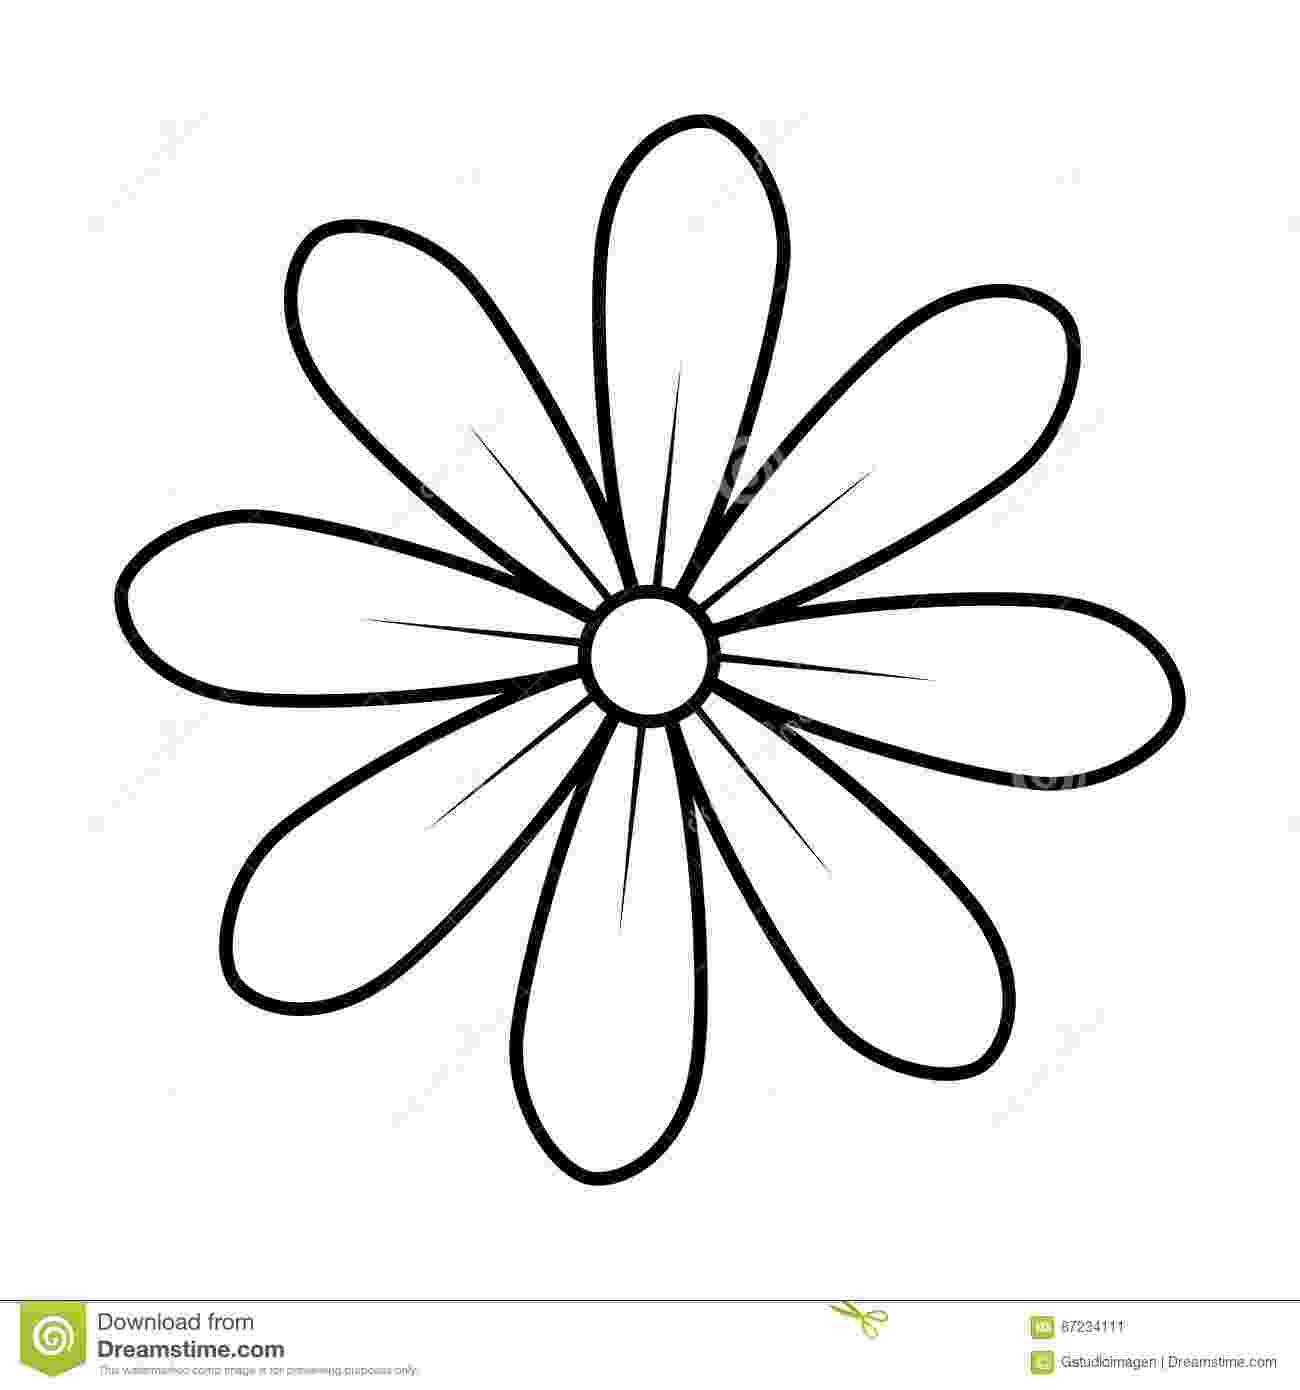 imagenes de margaritas para colorear monochrome contour of daisy flower icon floral design de para imagenes colorear margaritas